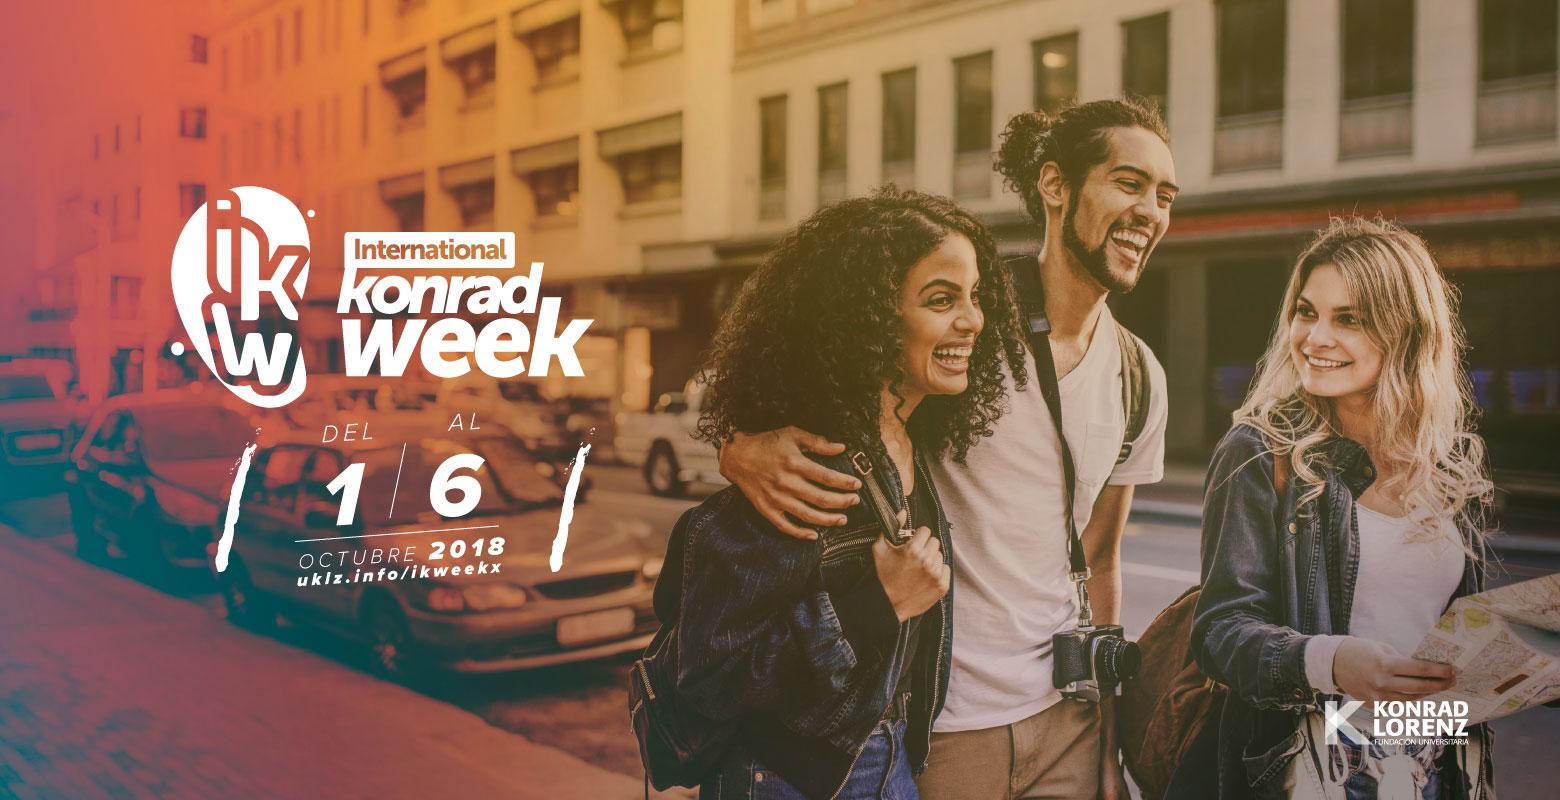 X International Konrad Week